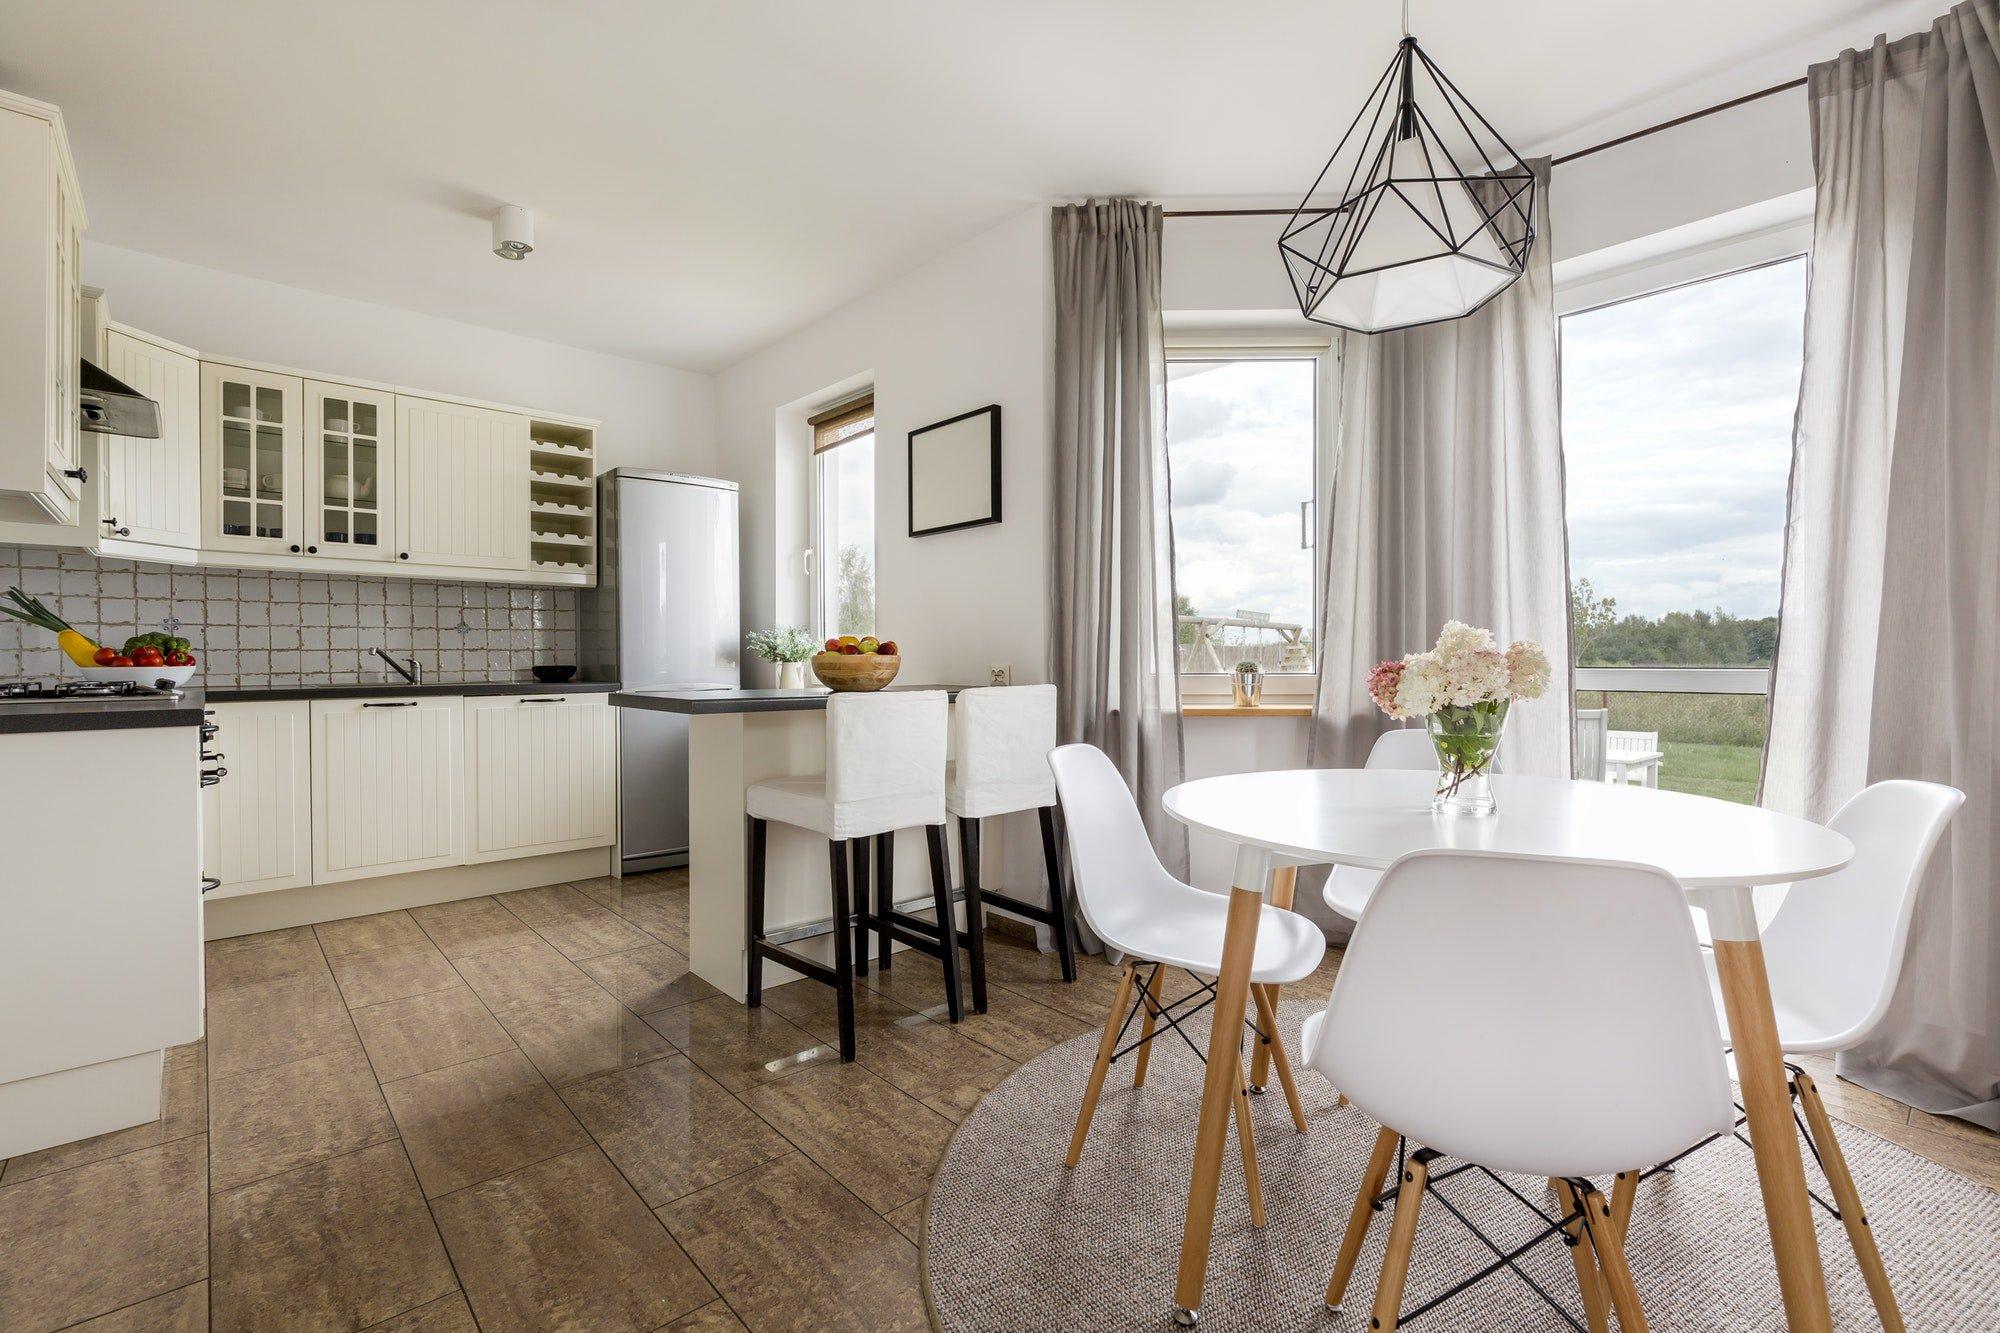 Kitchen in a modern house